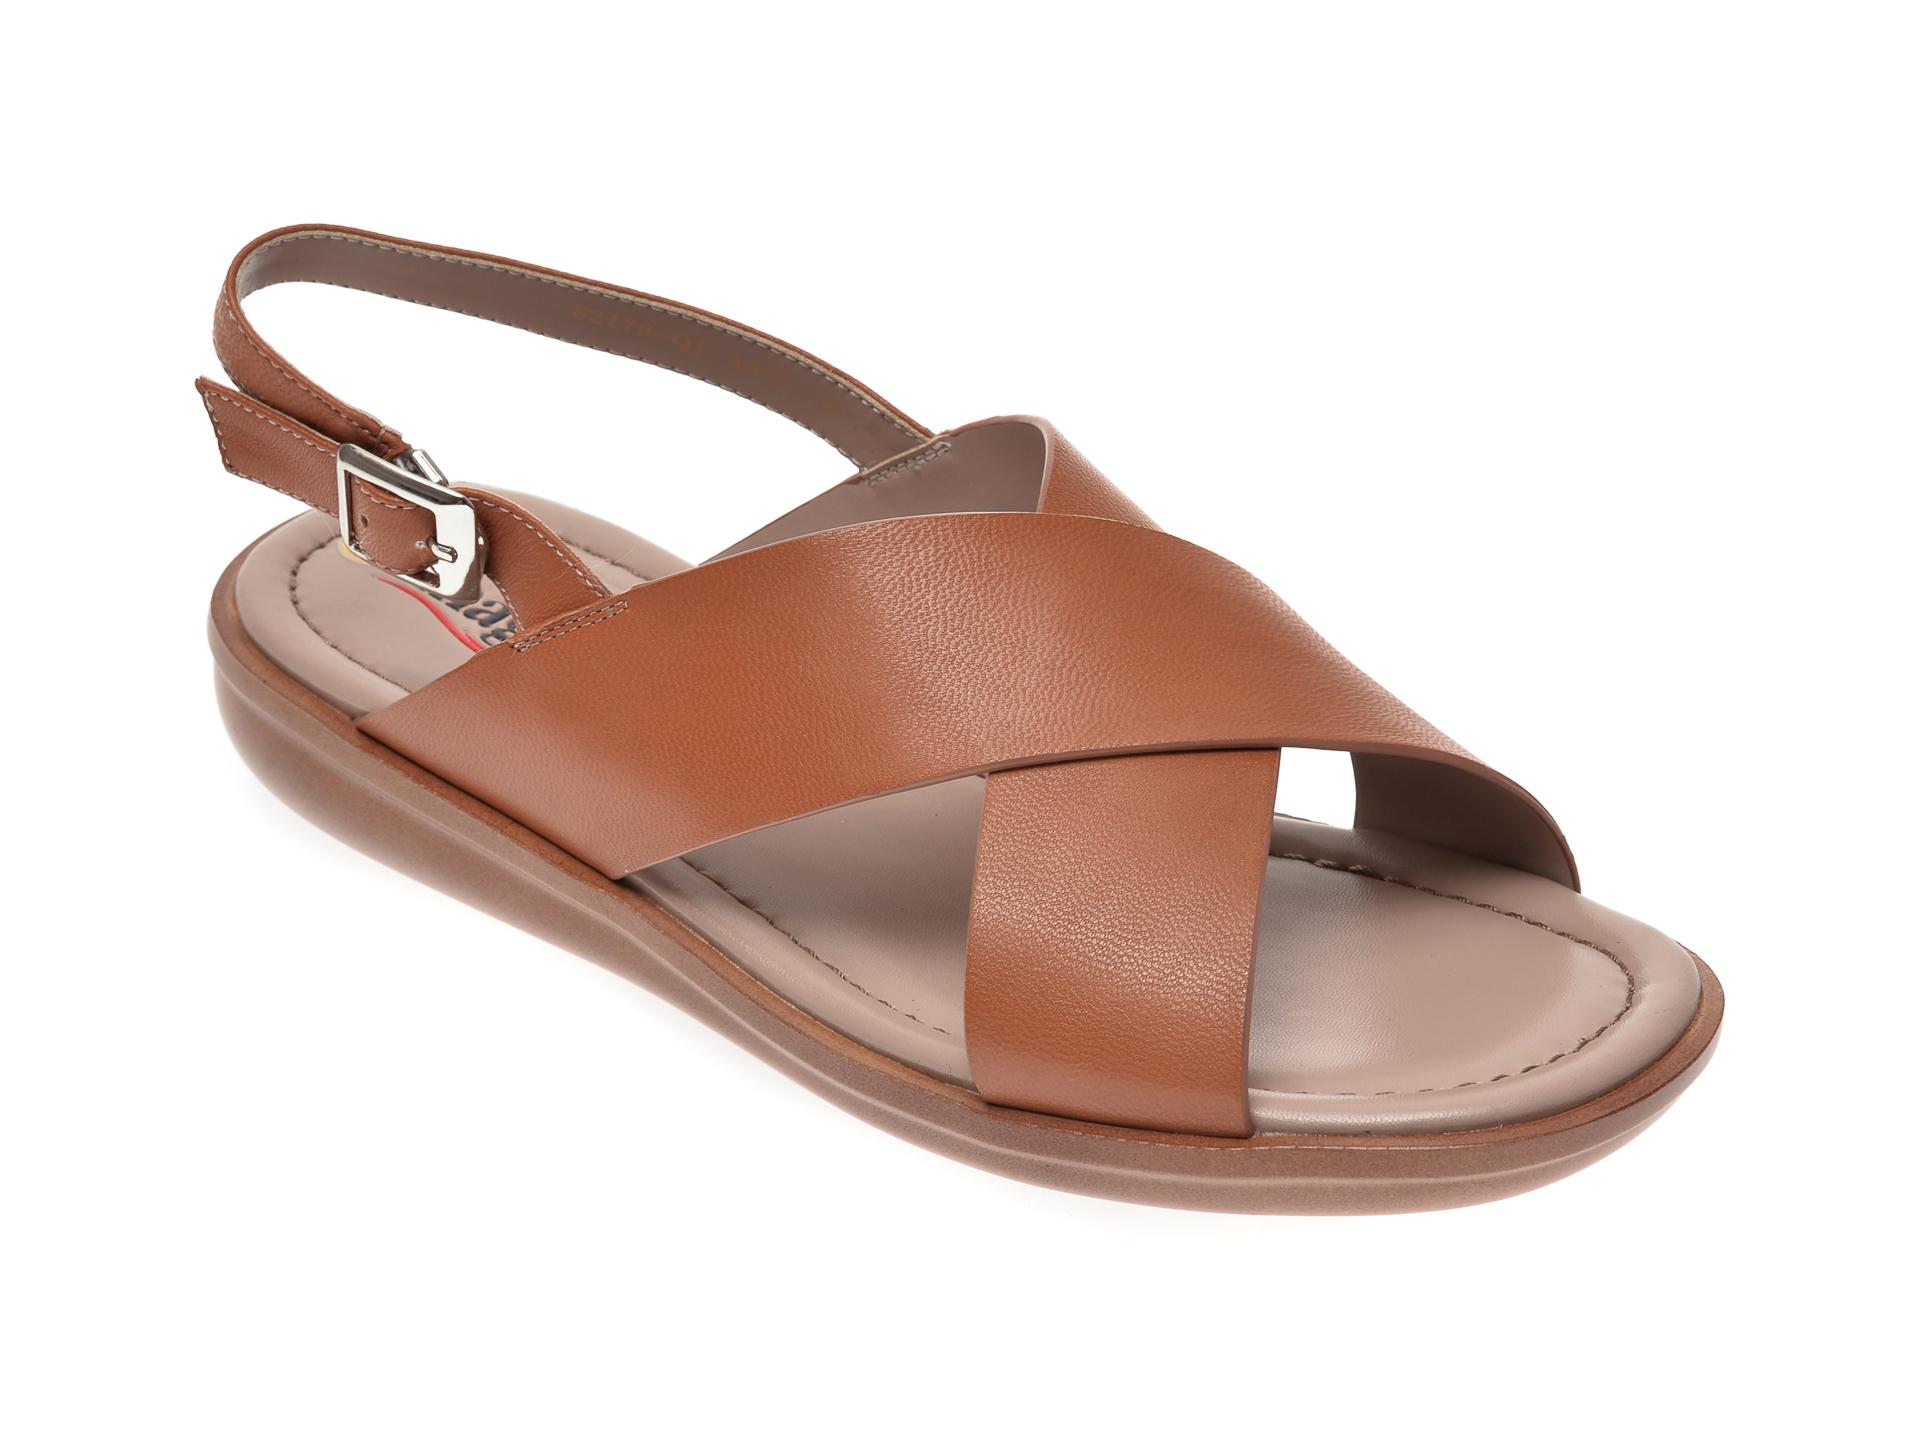 Sandale IMAGE maro, 82179Q1, din piele naturala